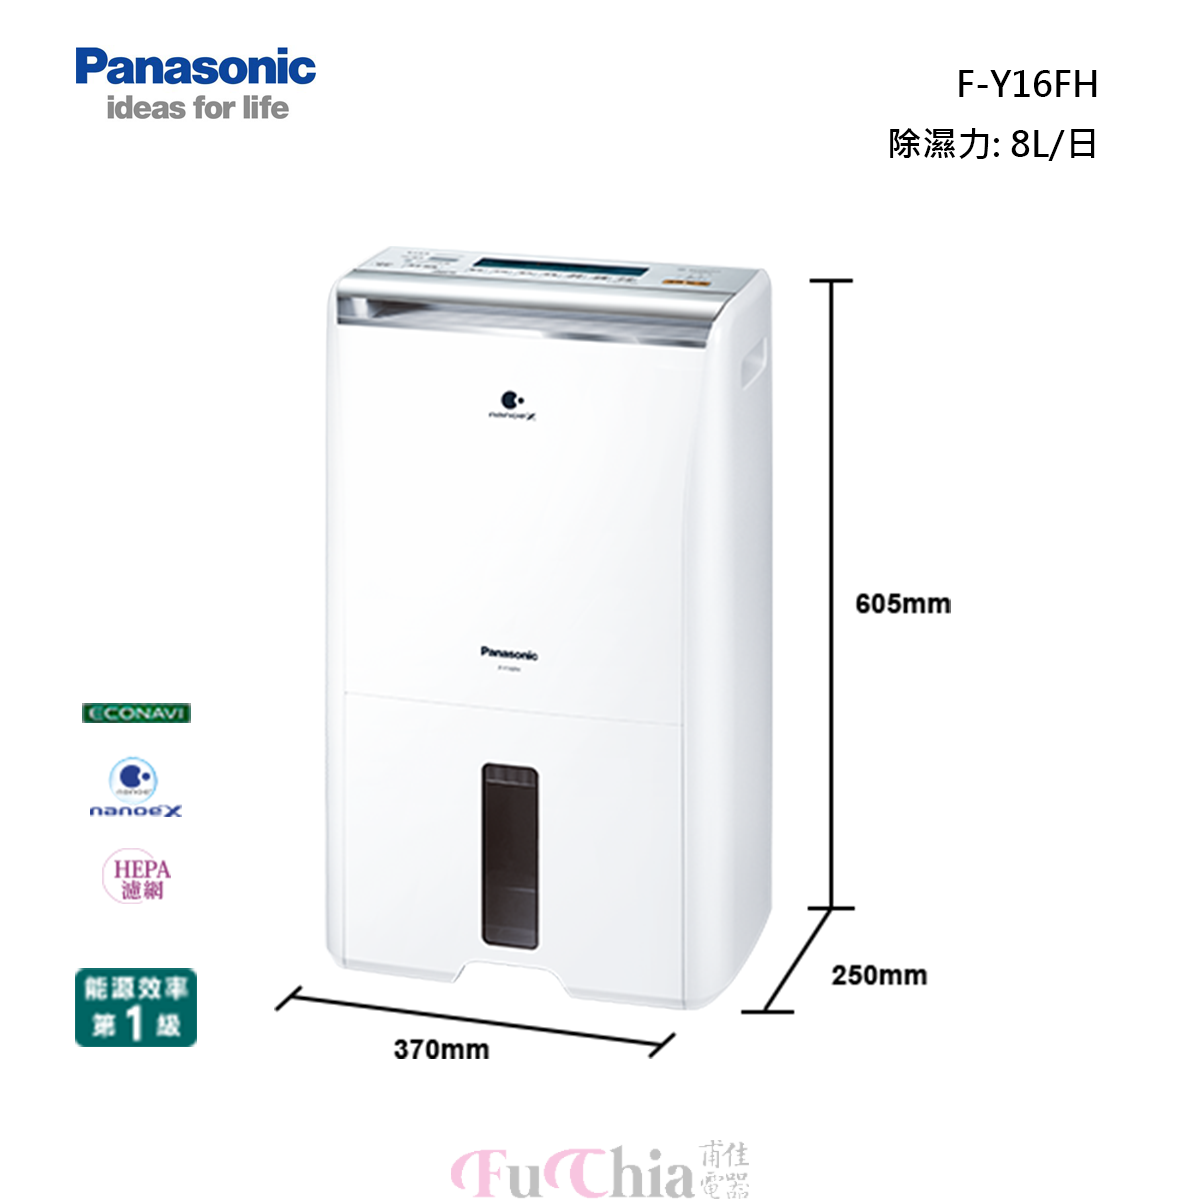 Panasonic F-Y16FH 除濕清淨型 除濕機 除濕力 8L/日